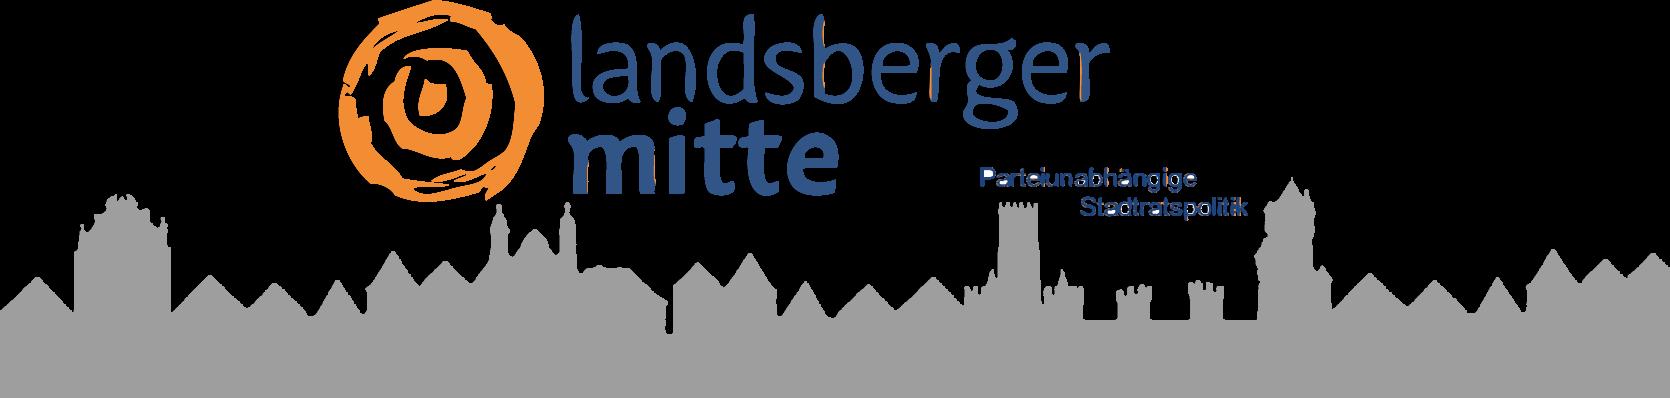 Landsberger Mitte